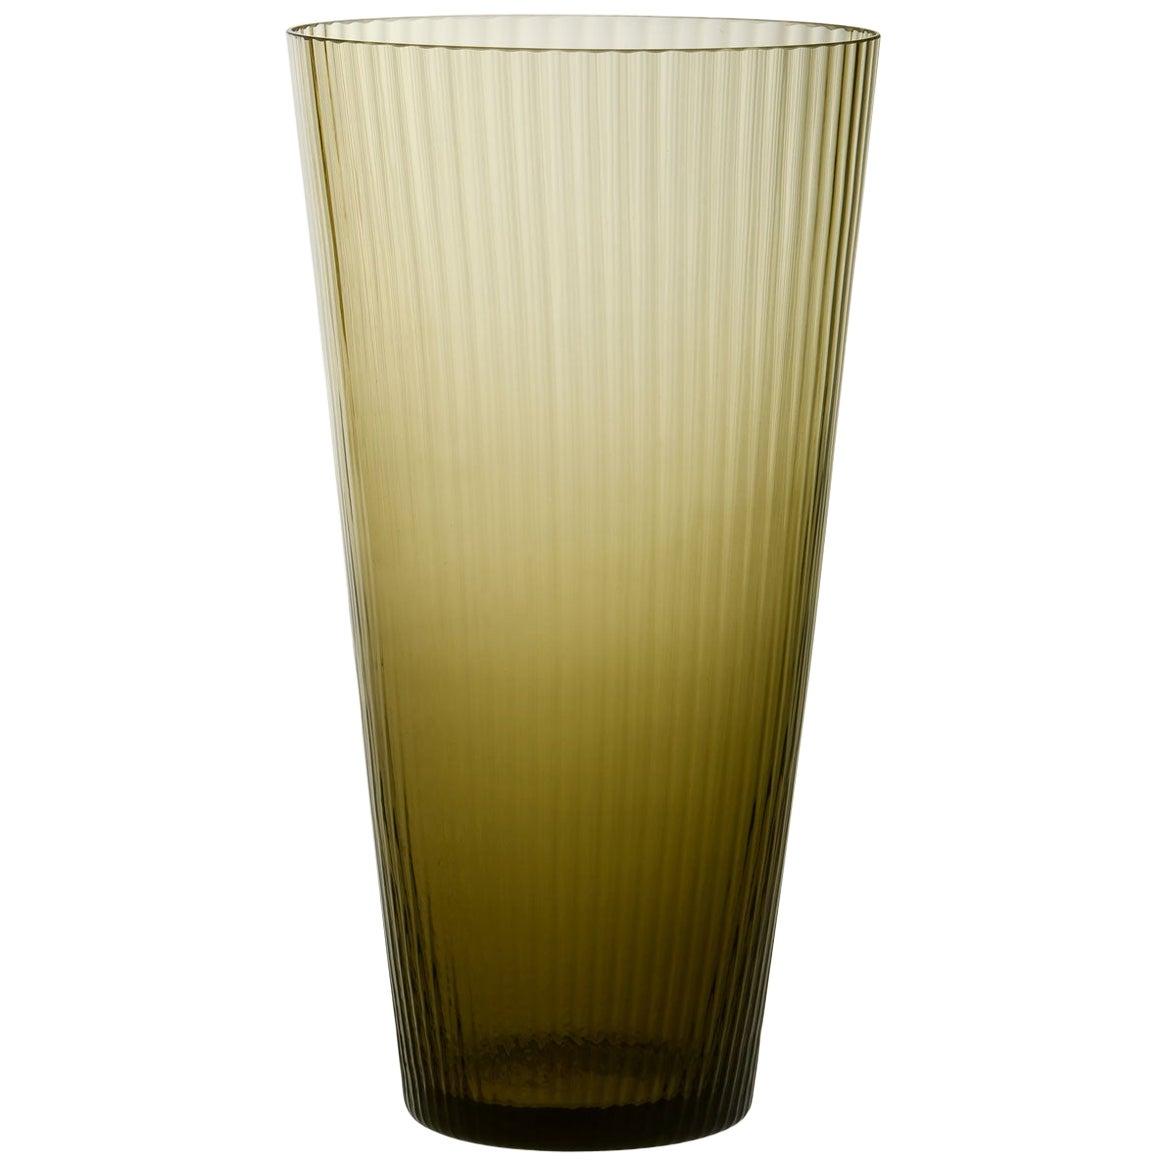 Vaso Squadrato34, Vase Handcrafted Muranese Glass, Angora Plisse MUN by VG